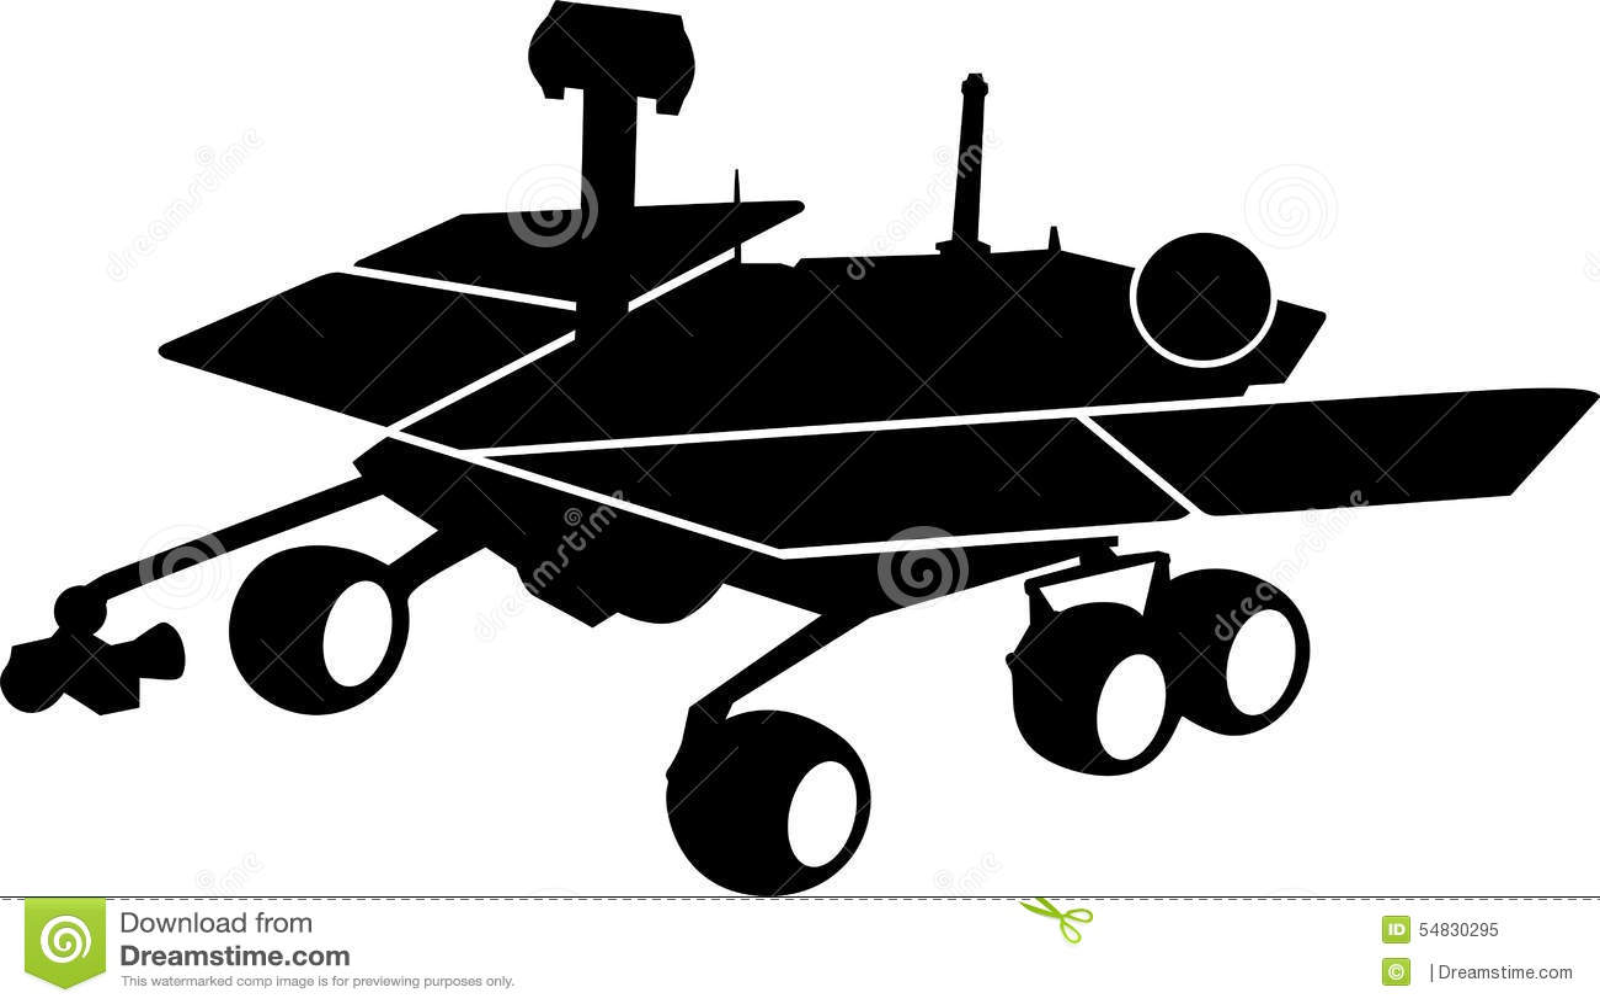 mars rover vector - photo #15